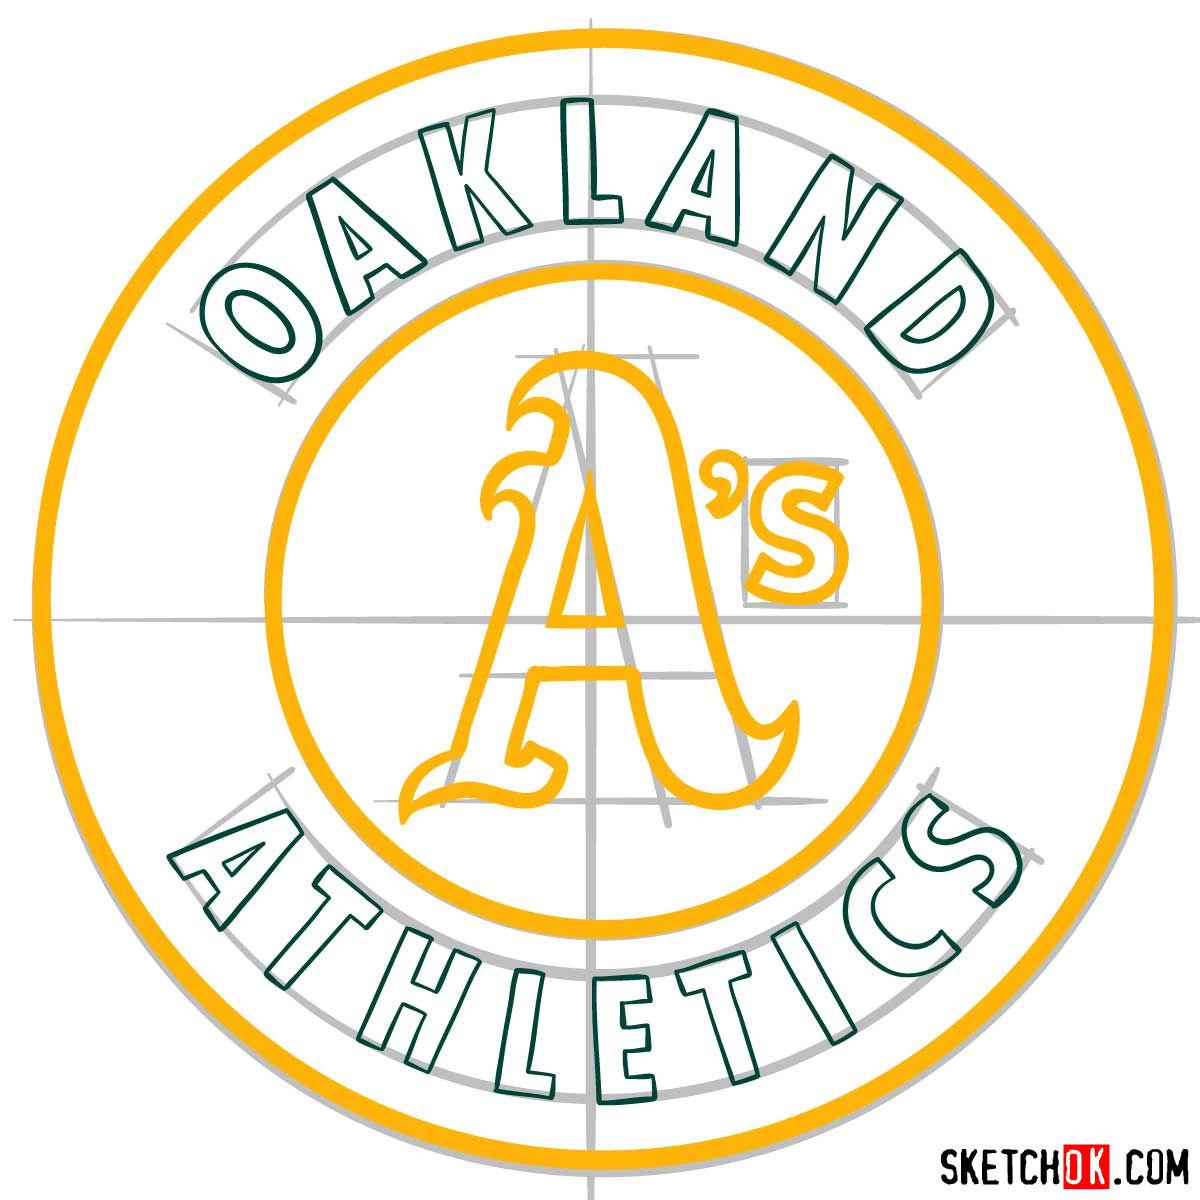 How to draw Oakland Athletics logo | MLB logos - step 09